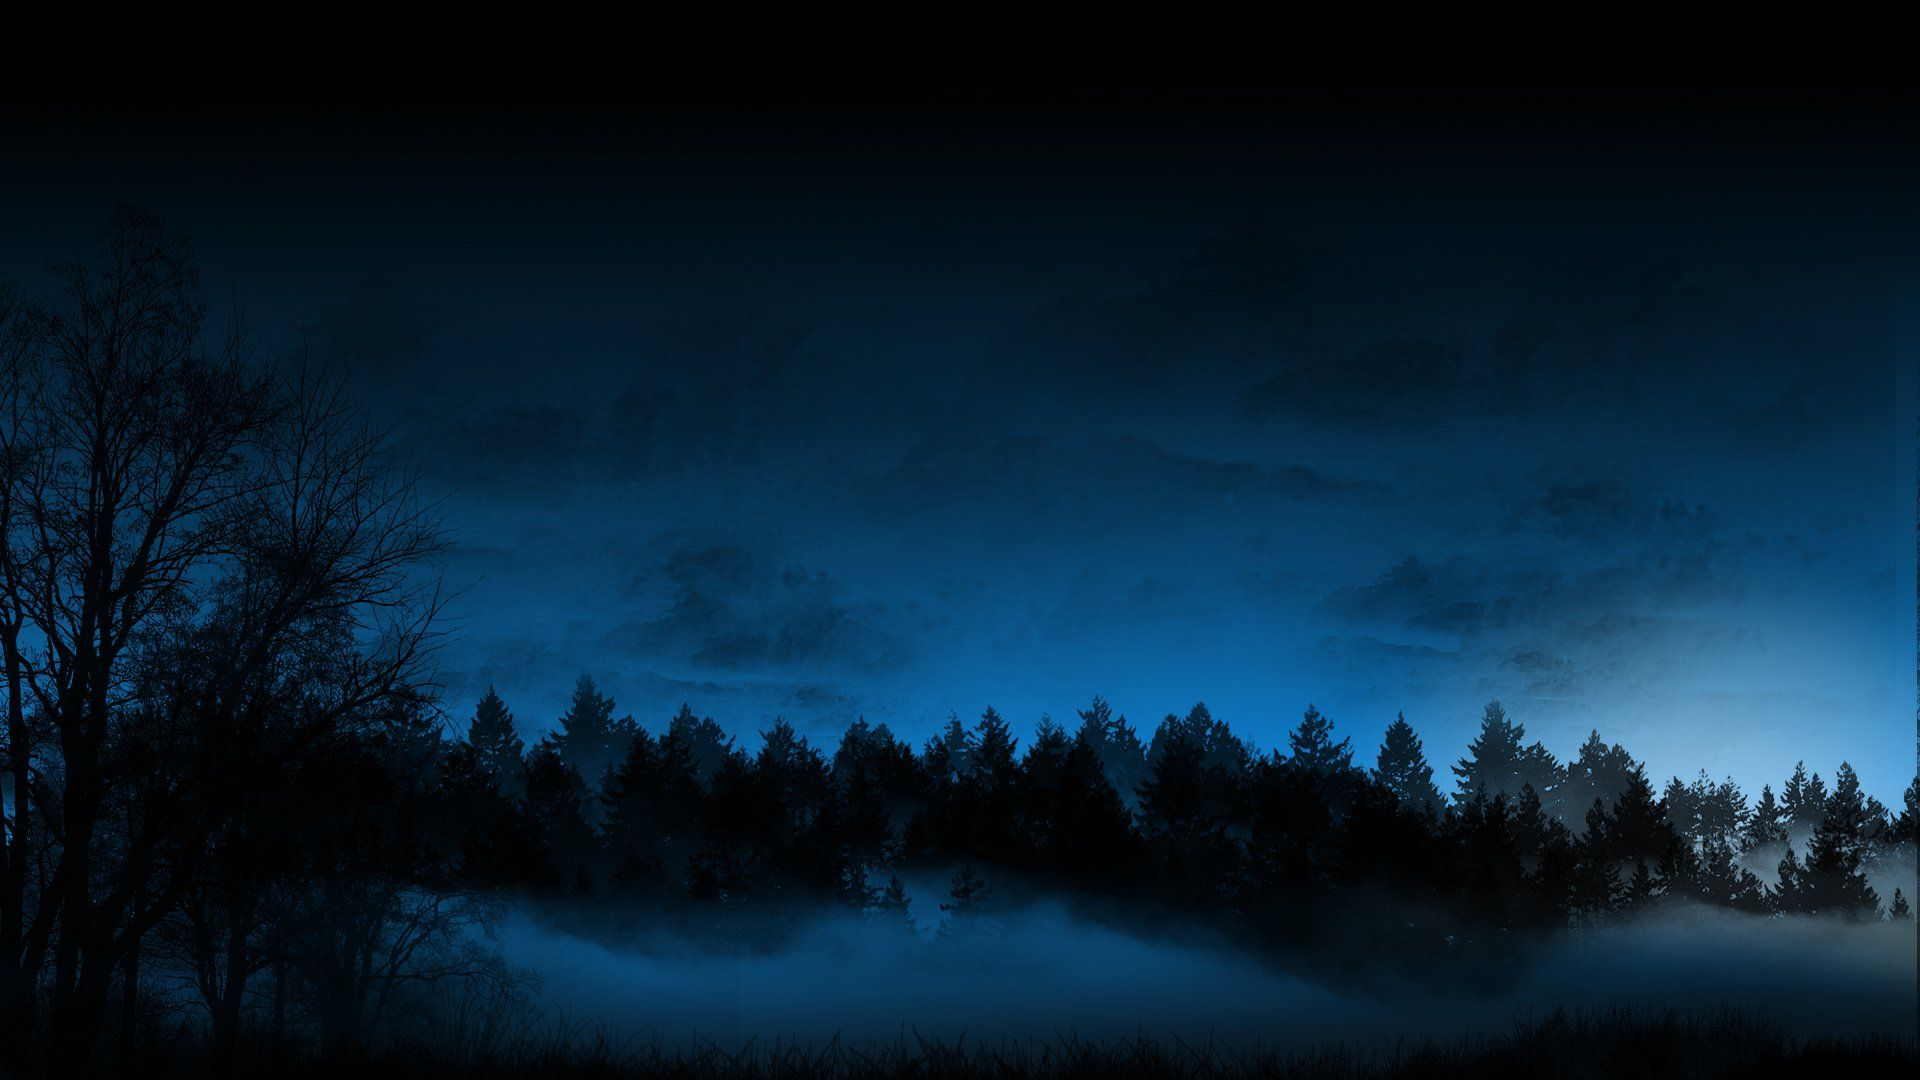 Dark Forest Cloud Cold Fog Night Dark Landscape Winter Wallpaper Bosque De Noche Paisajes Bosque